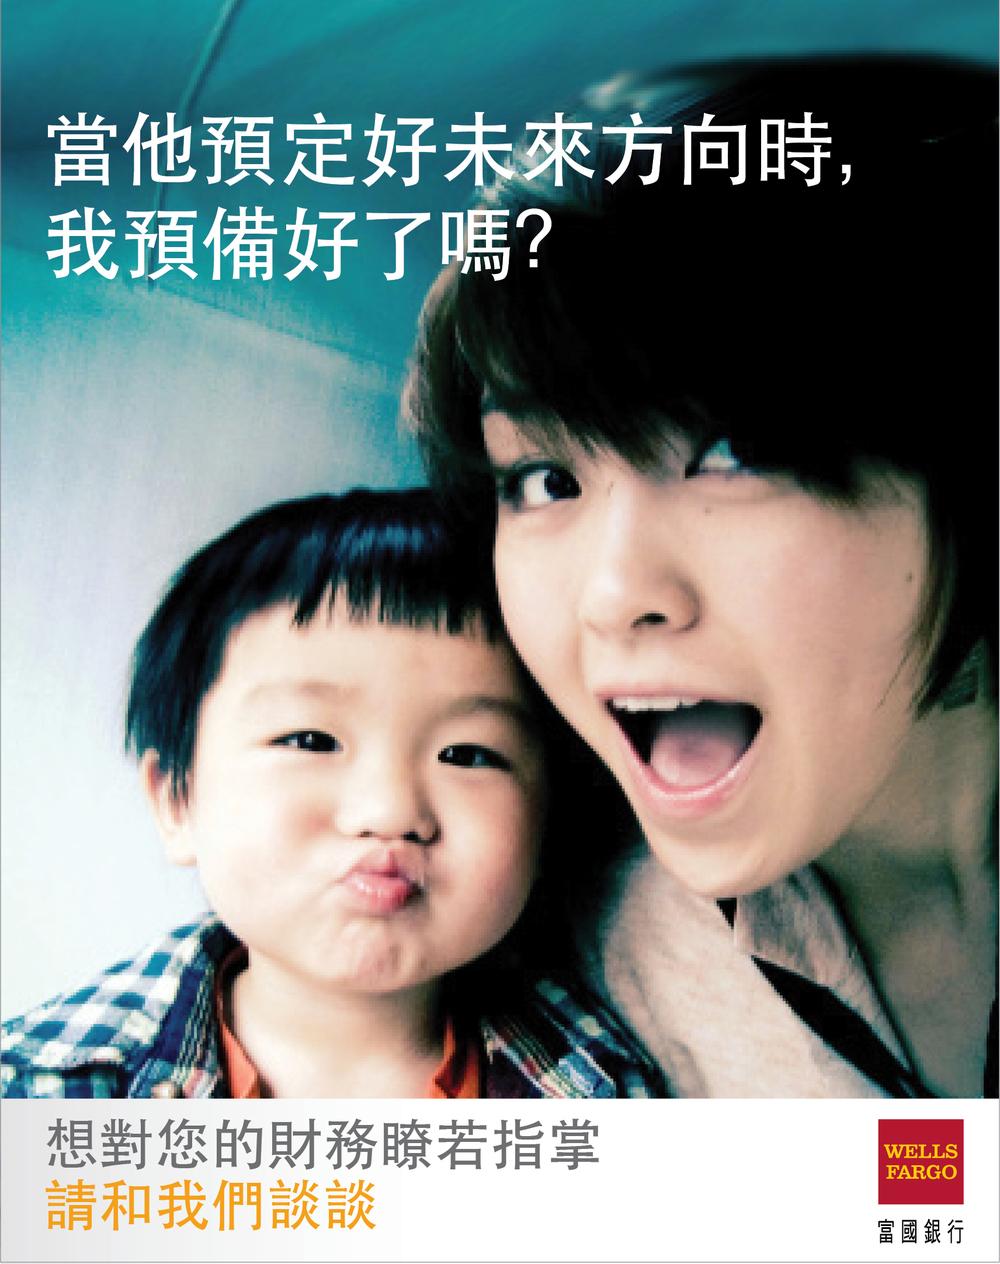 WF_photobooth poster_2164.jpg